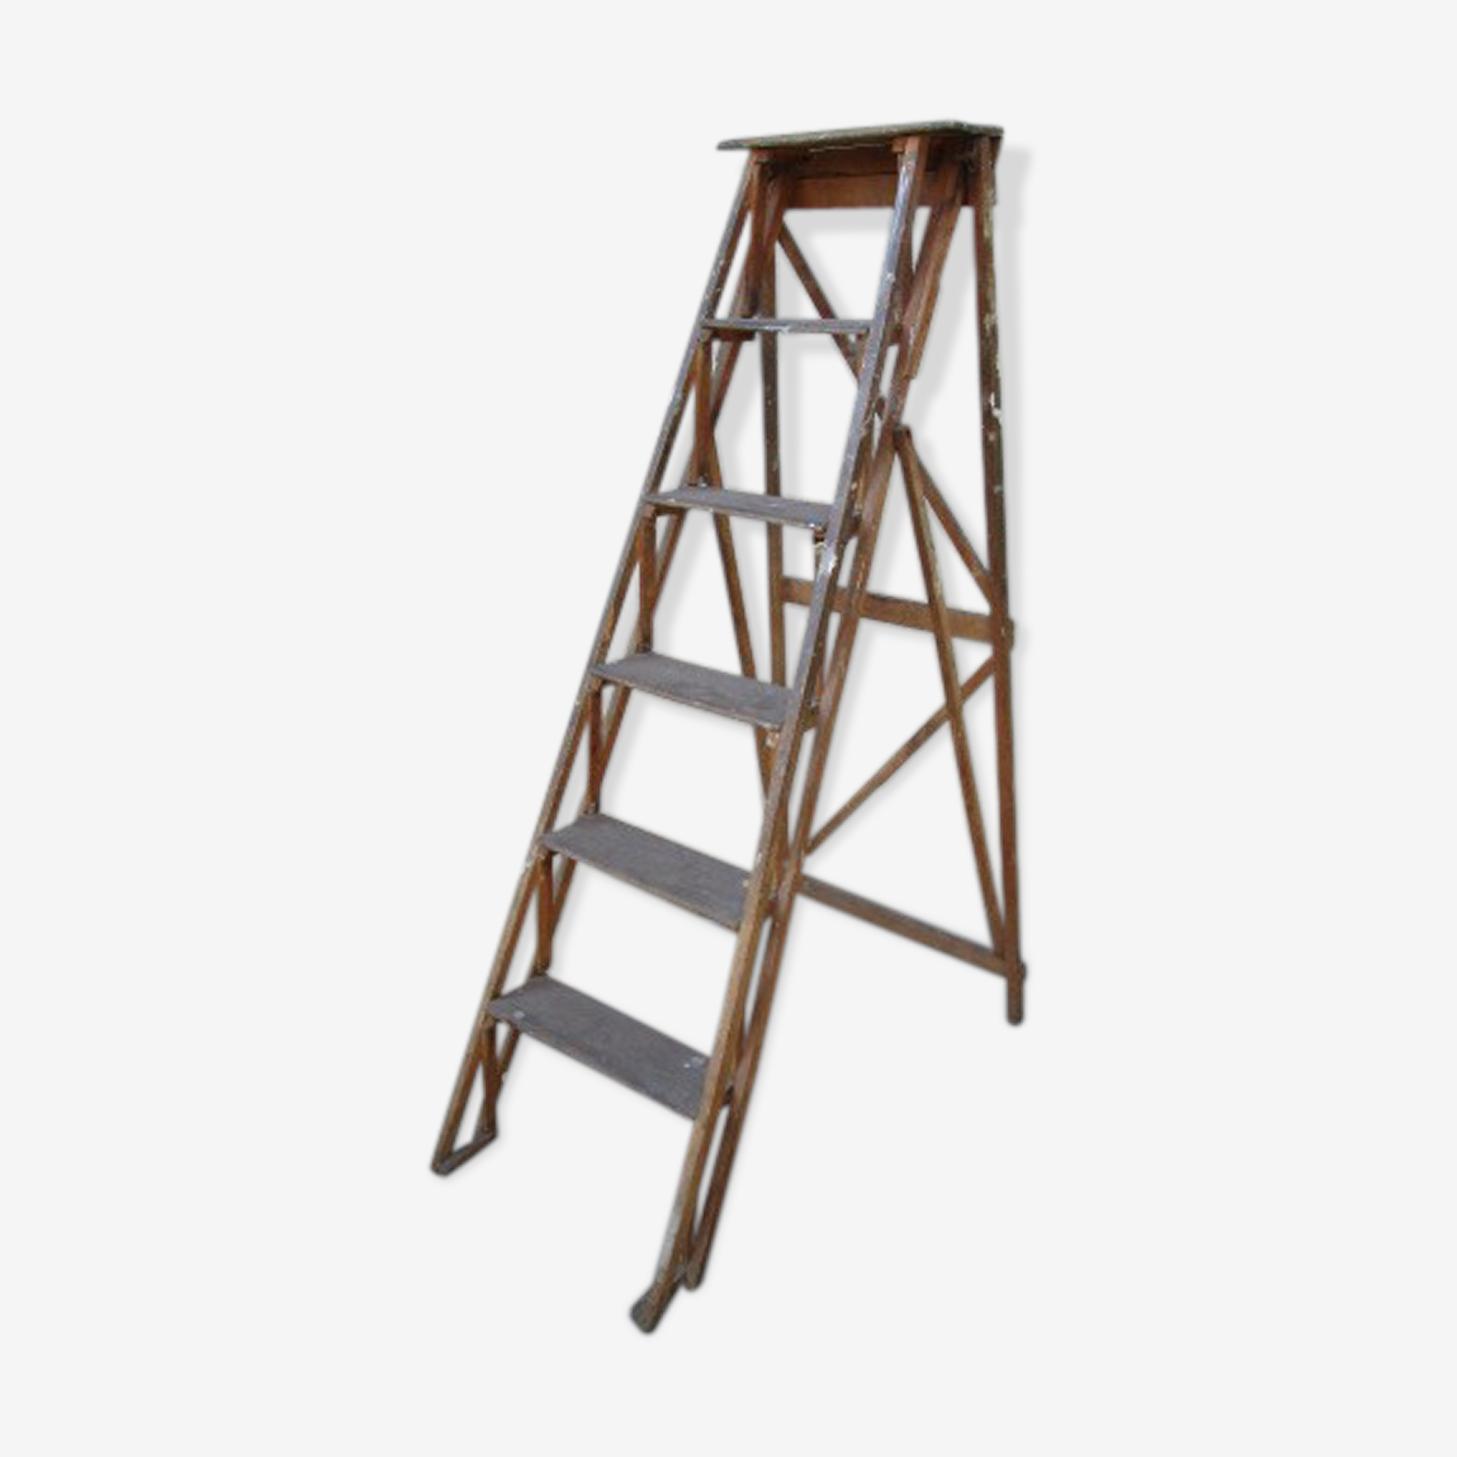 Former painter wooden stepladder